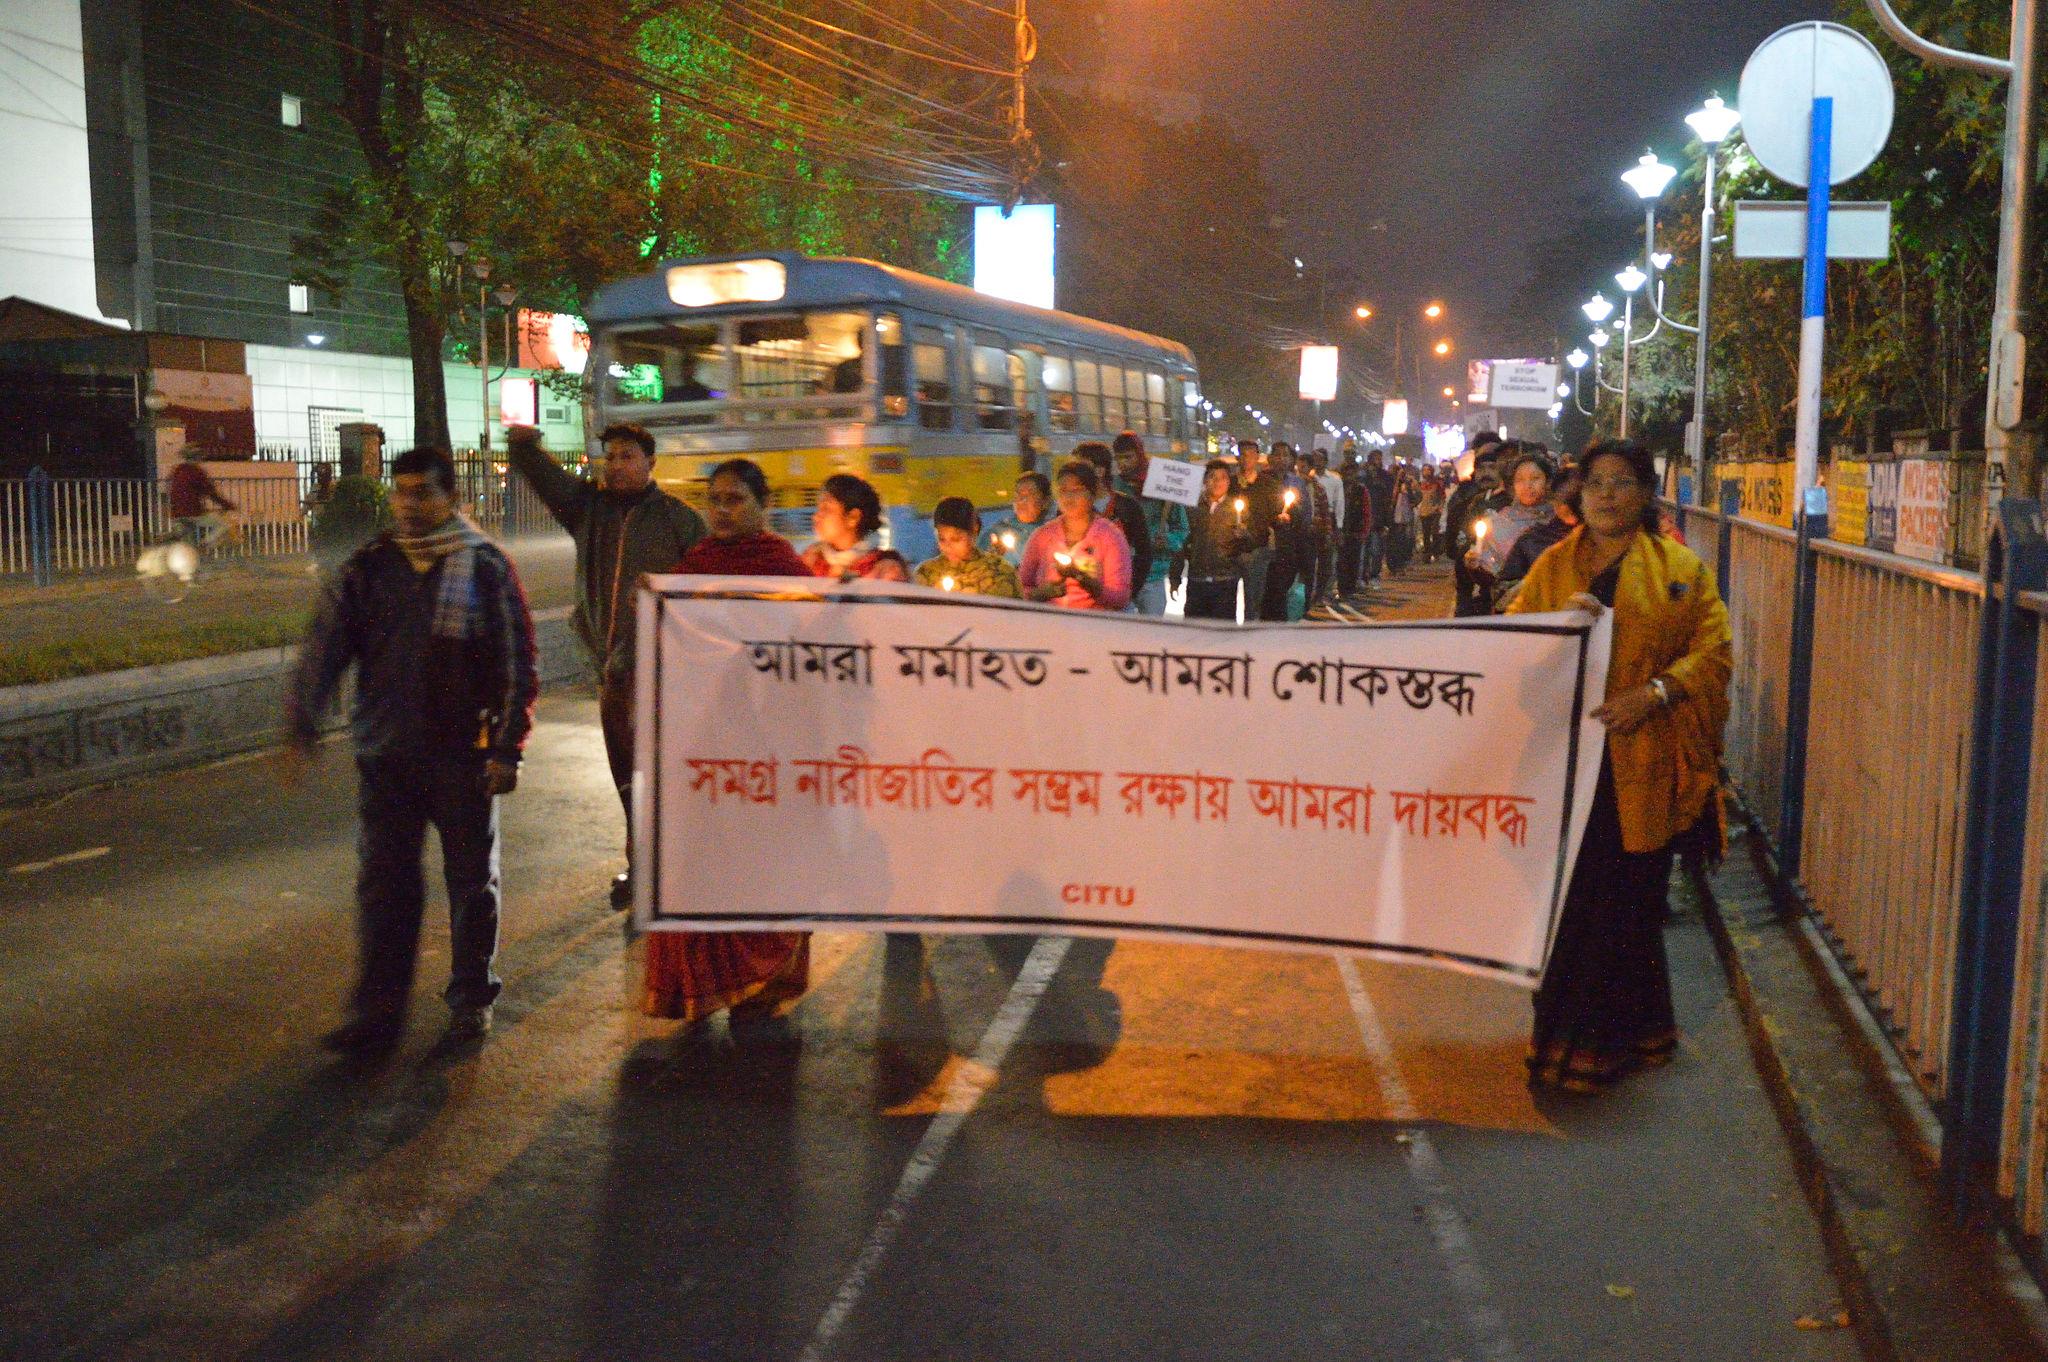 Silent Protest at Salt Lake City in Kolkata after Jyoti's death. Photo: Biswarup Ganguly